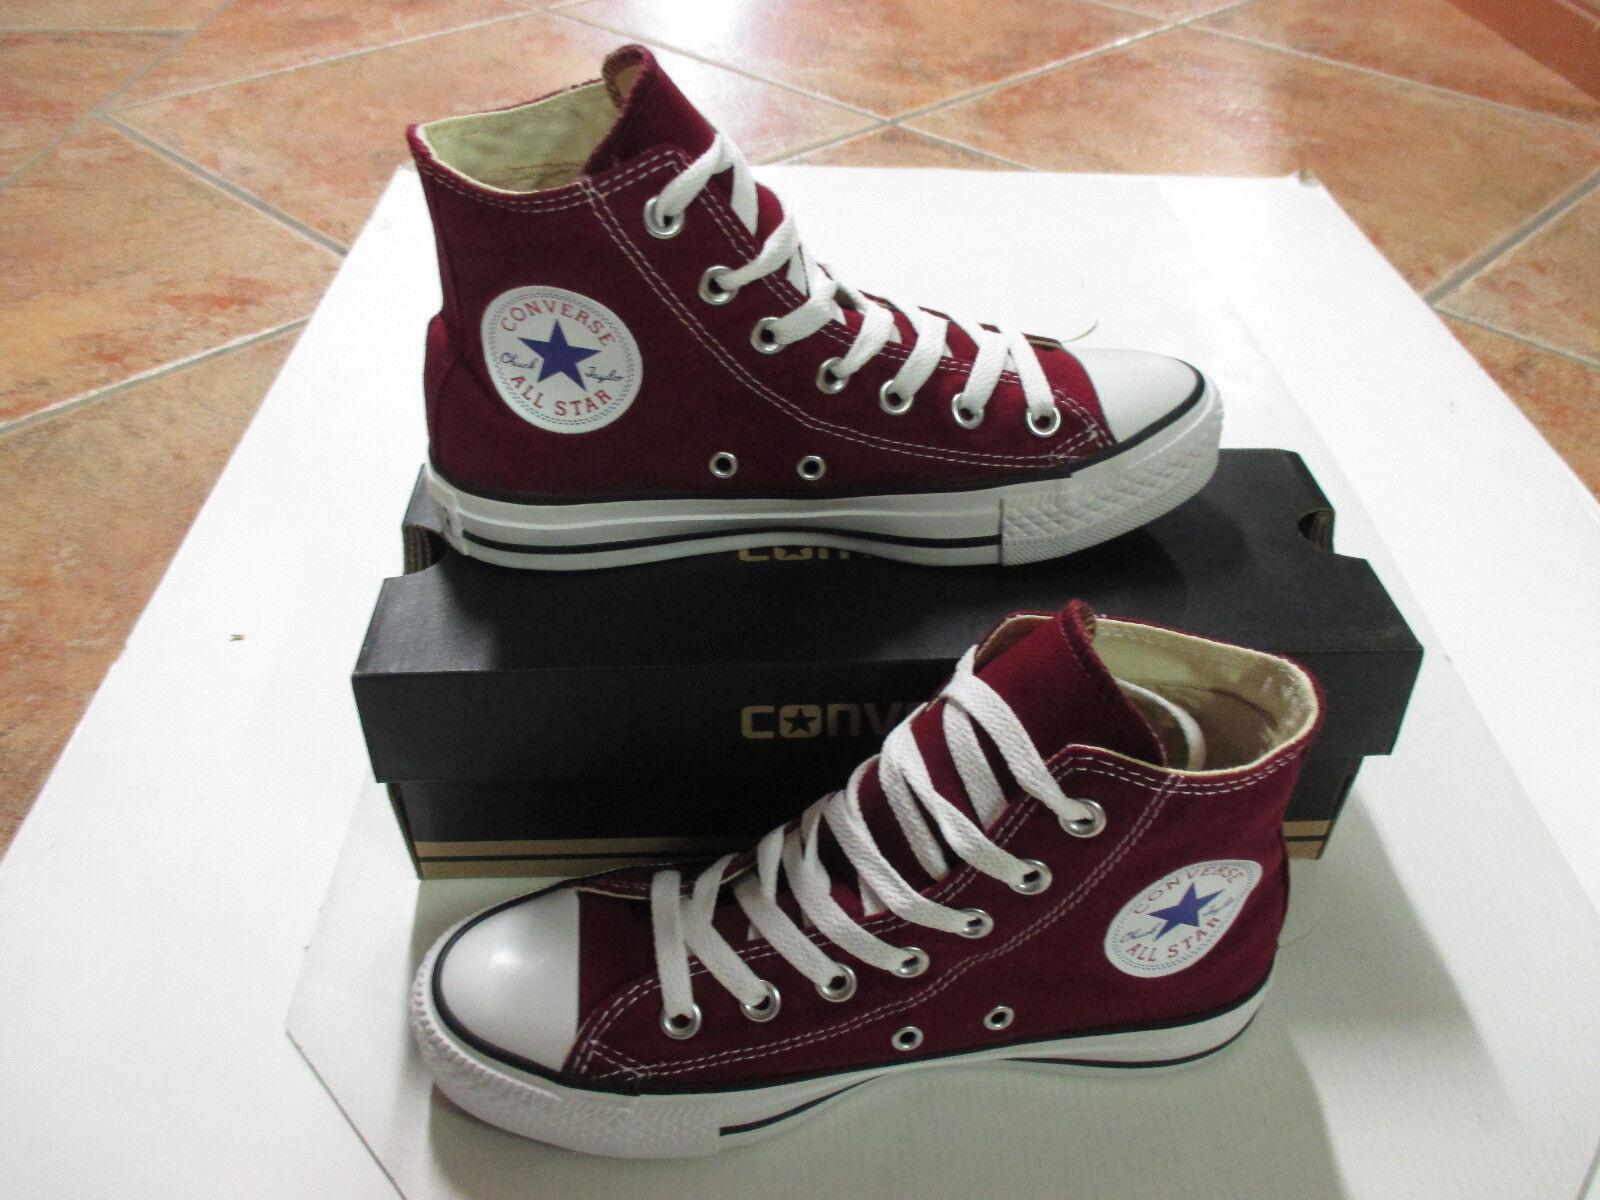 Converse Chucks All Star HI Größe 36 Maroon weinrot M9613C Neu Sneaker